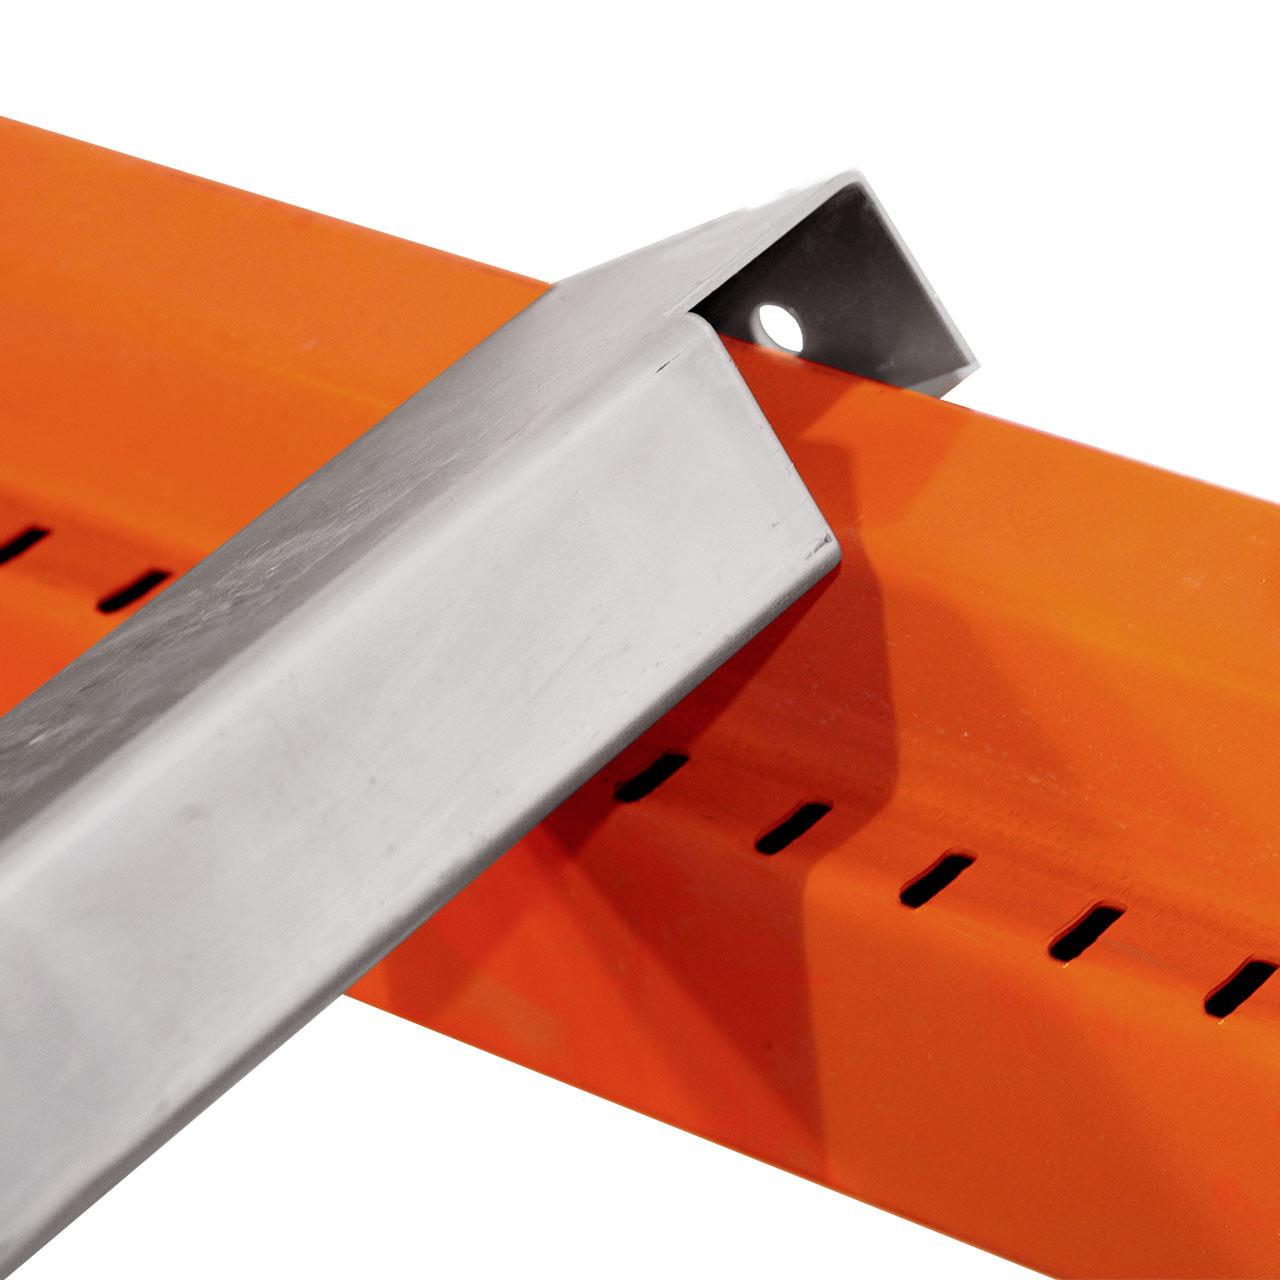 Standard galvanized pallet racking support